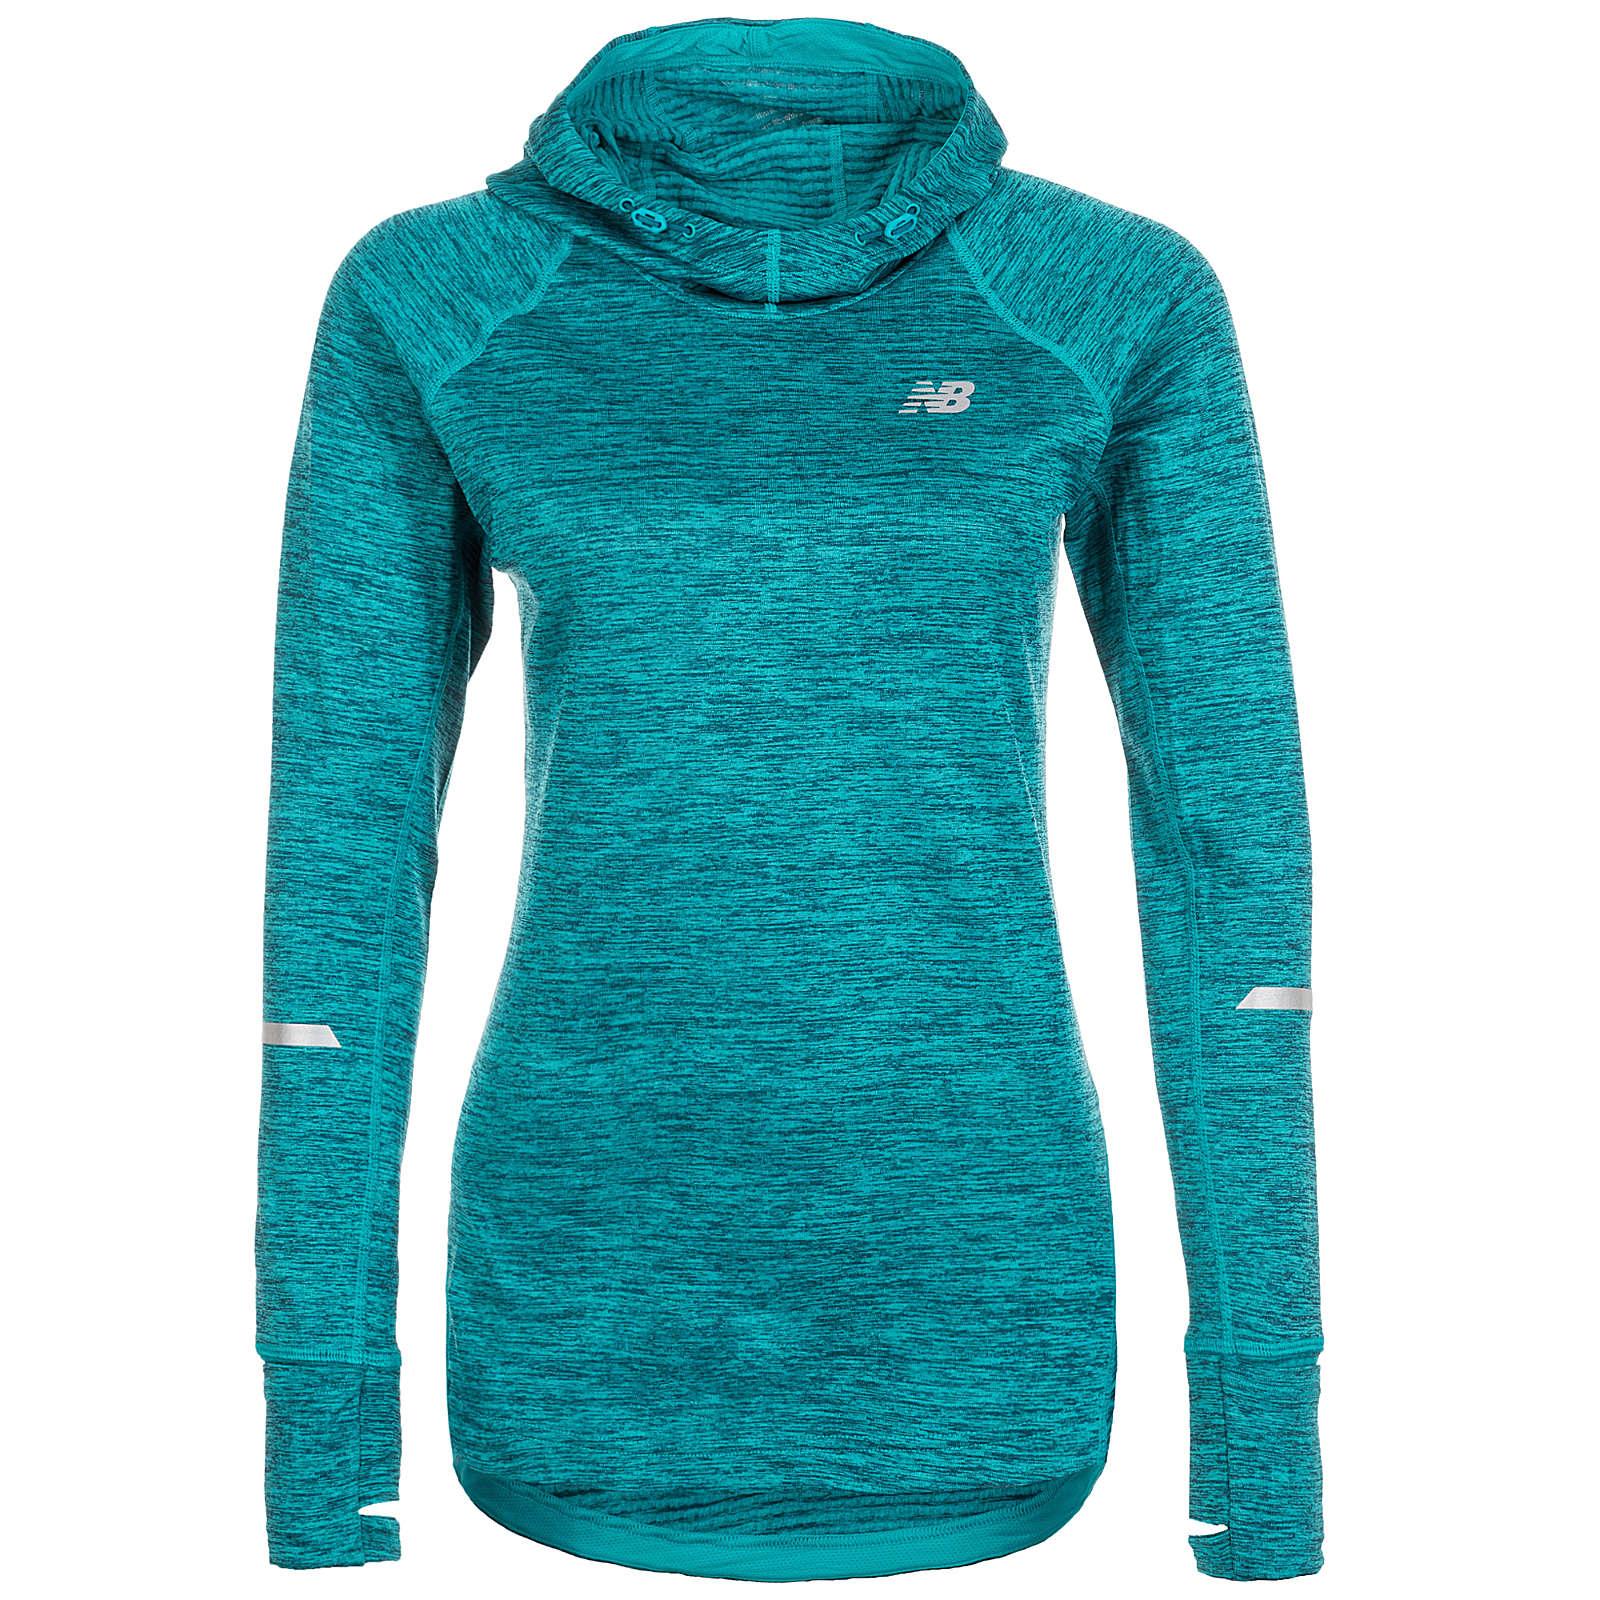 Under Armour Sweatshirt New Balance Heat Laufkapuzenpullover Dame bei Mirapodo - Neue Styles